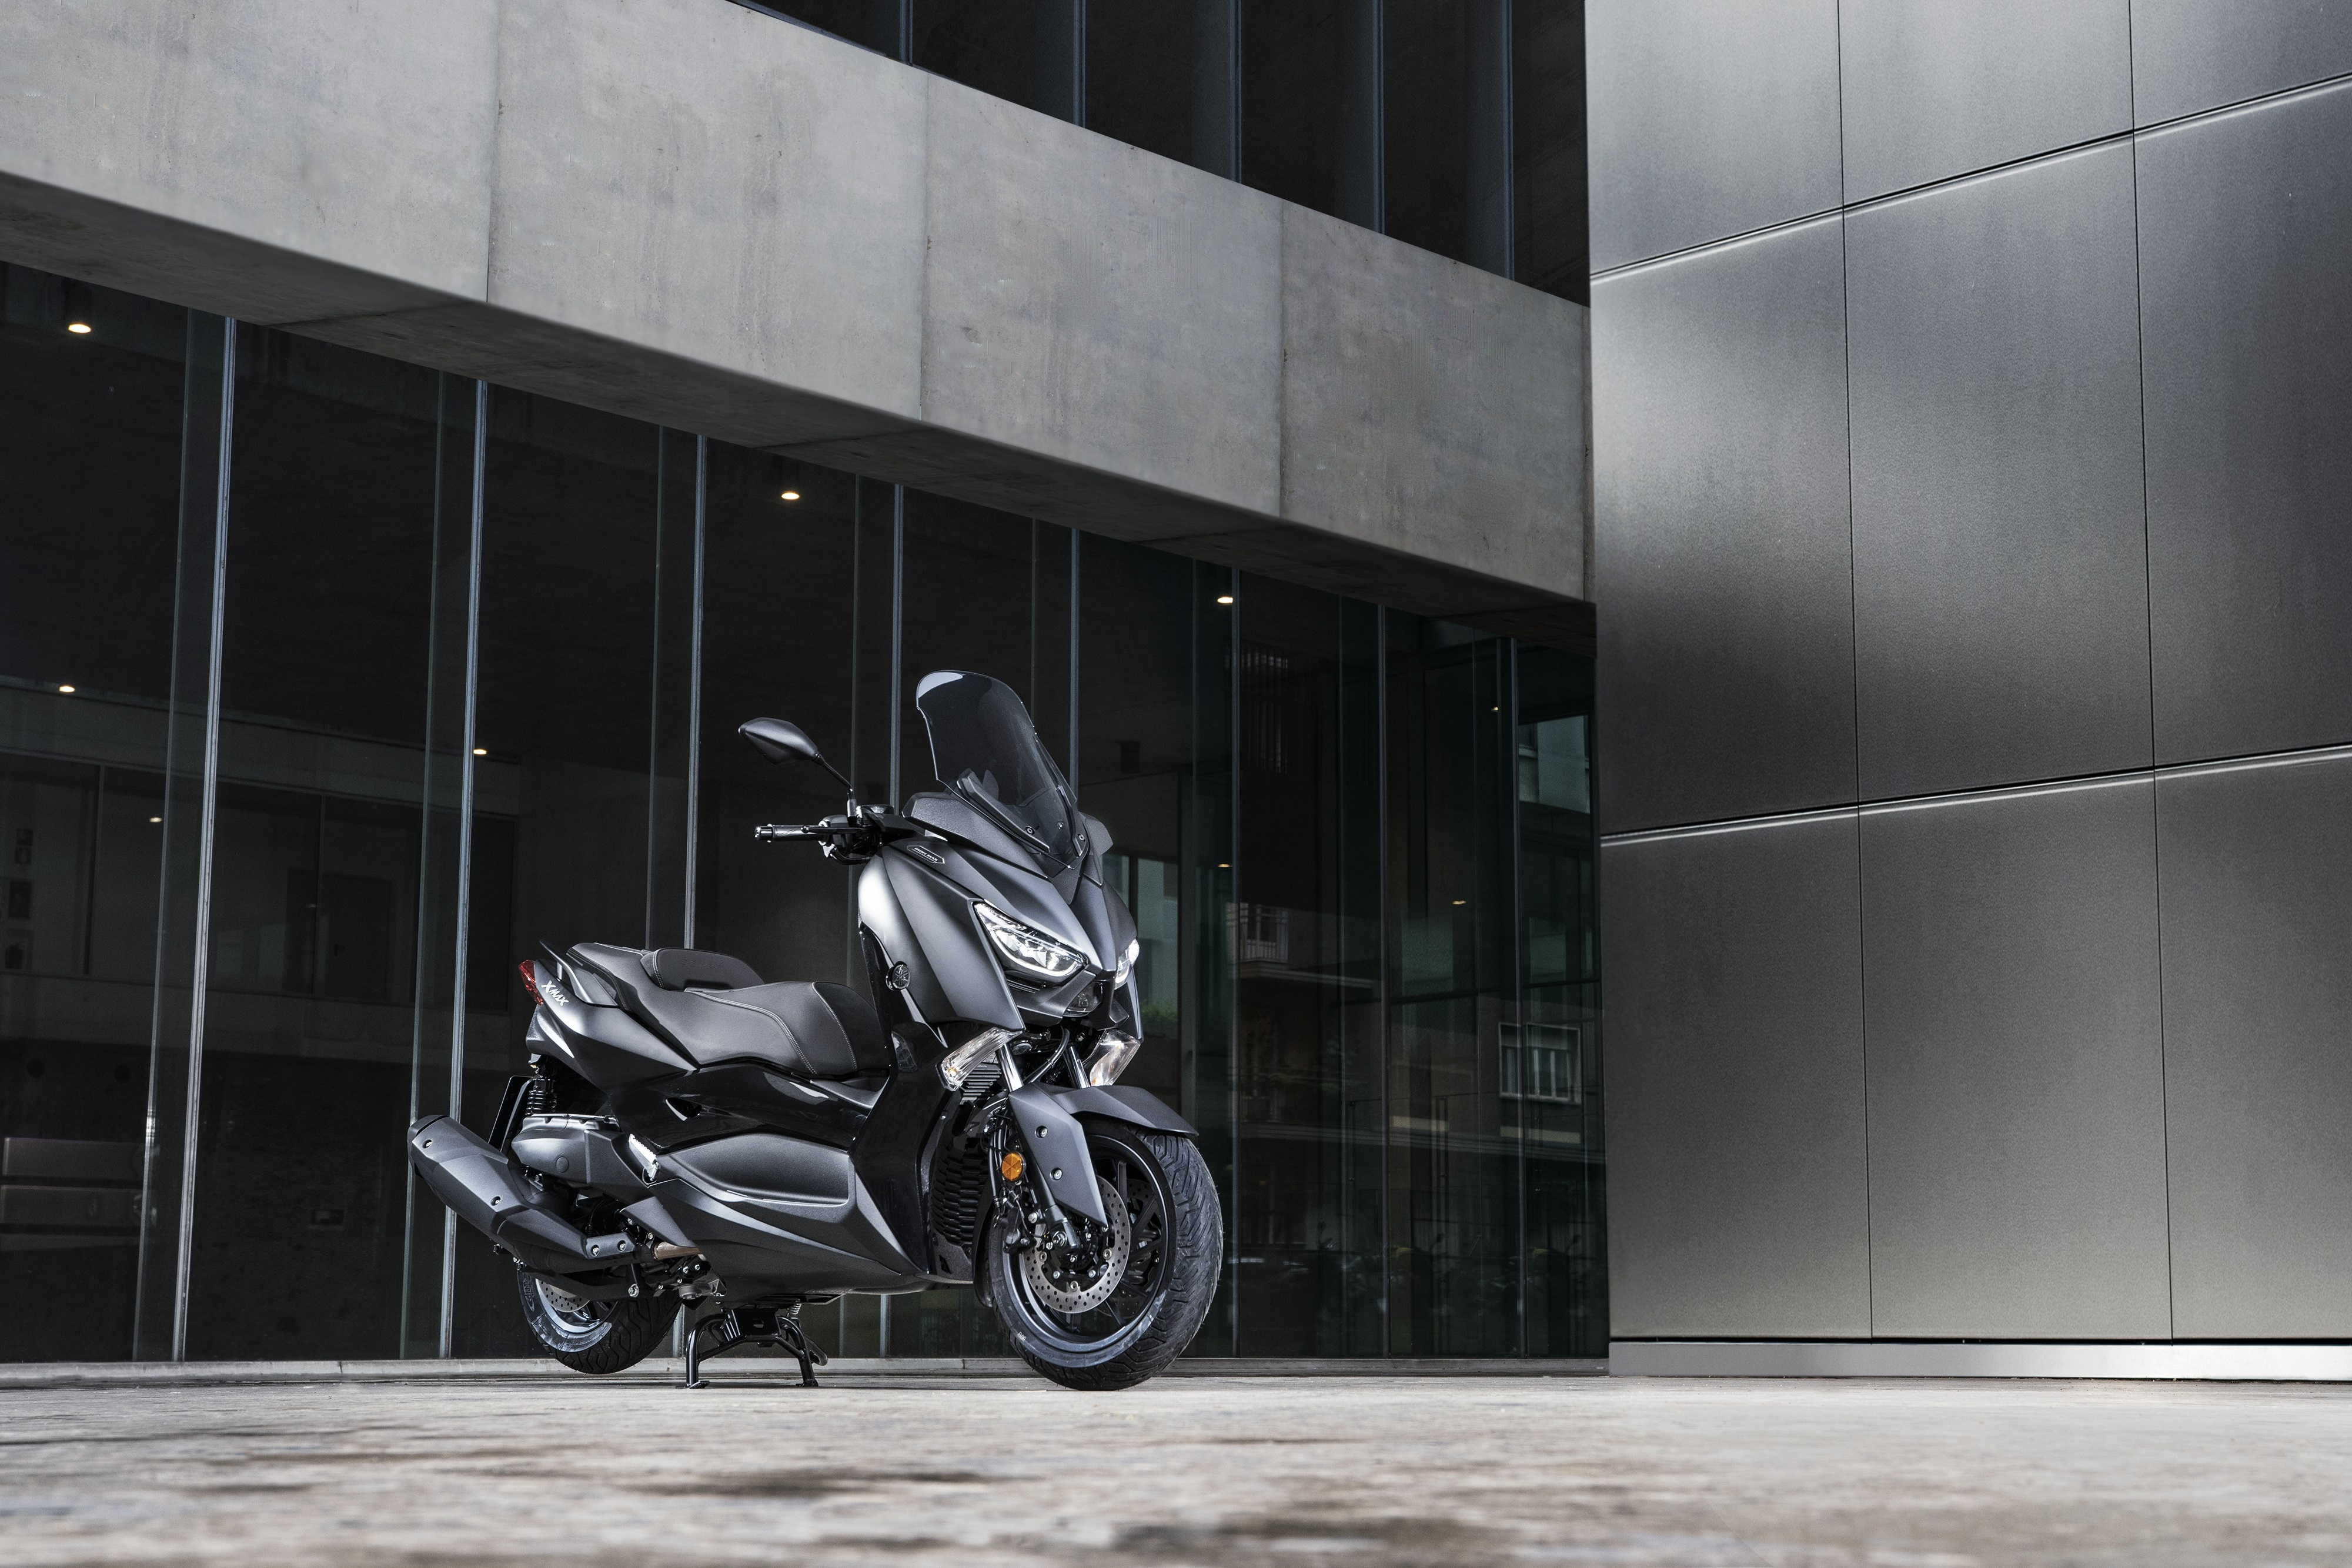 For Sale: Yamaha X-MAX 400 • The Bike Market